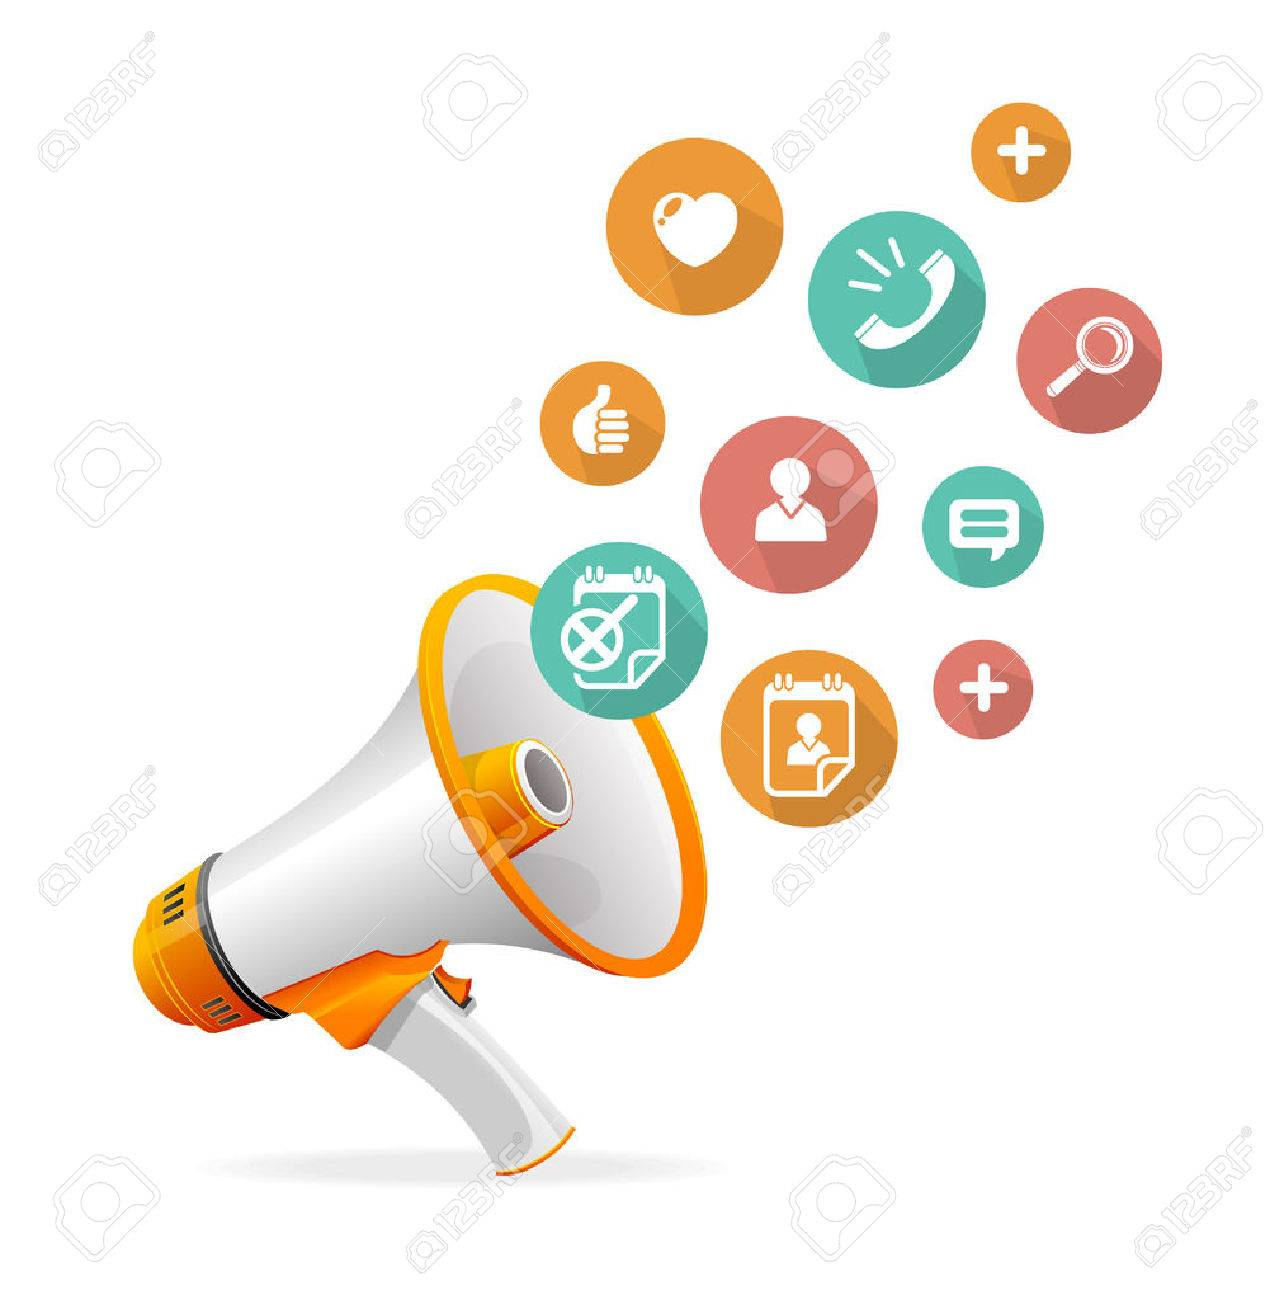 Illustration flat design concept icons and megaphone - 26081792